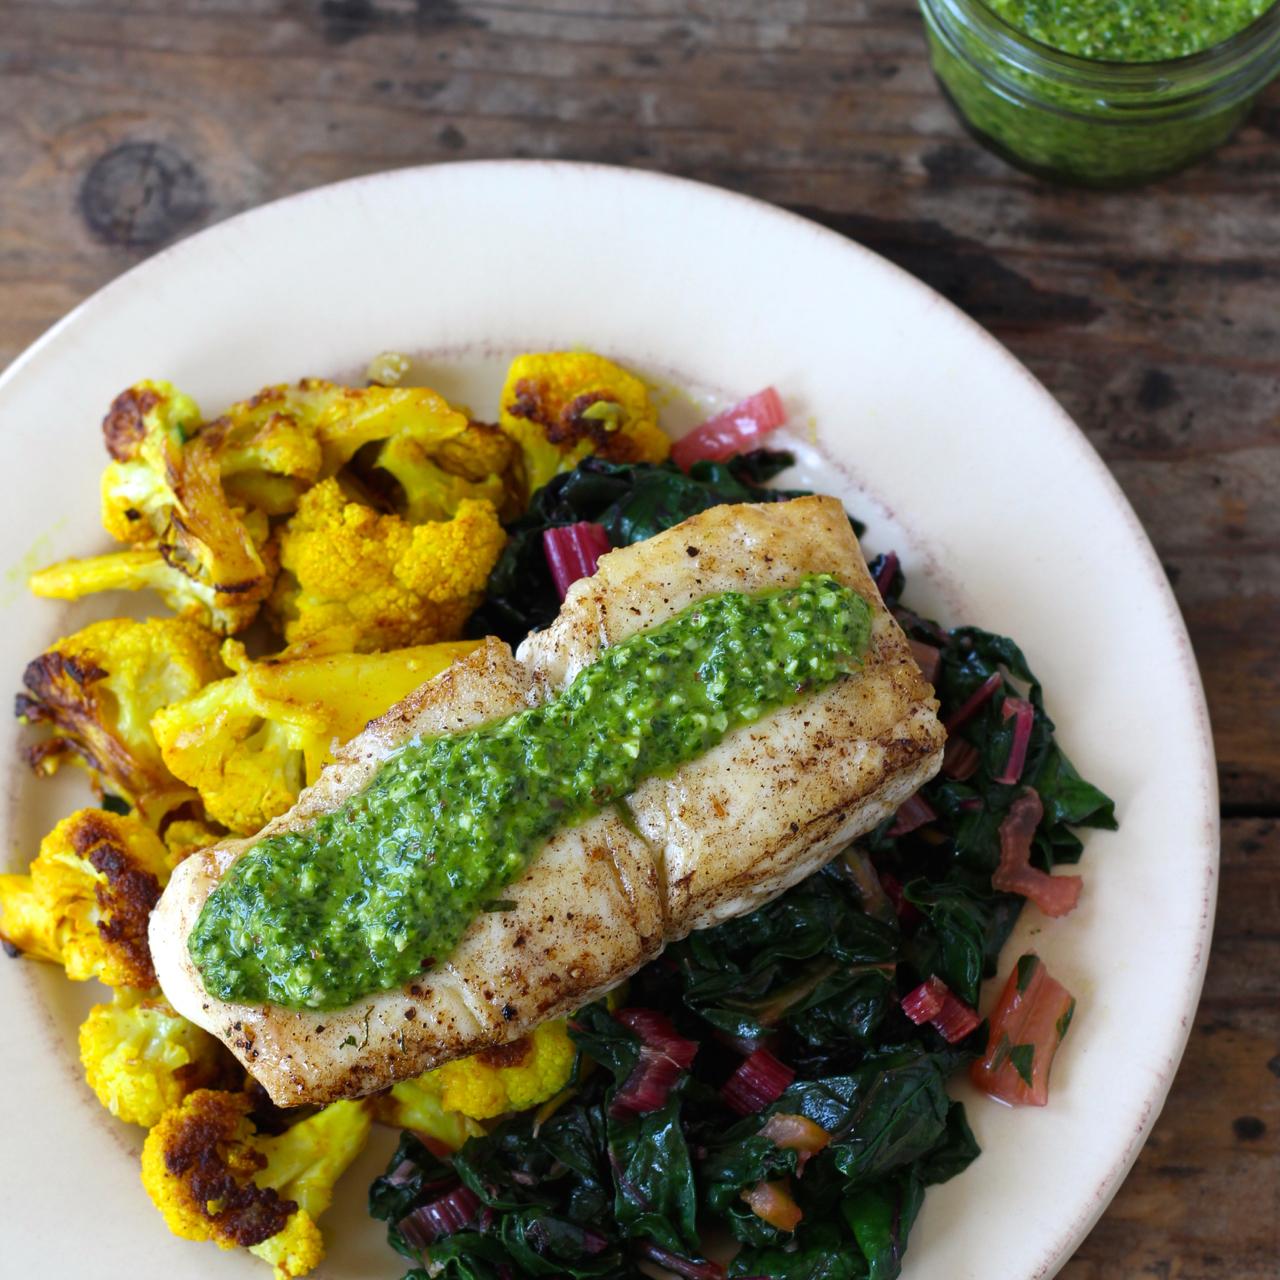 Seared Fish with Sauce Verte, Cauliflower, Preserved Lemon and Chard